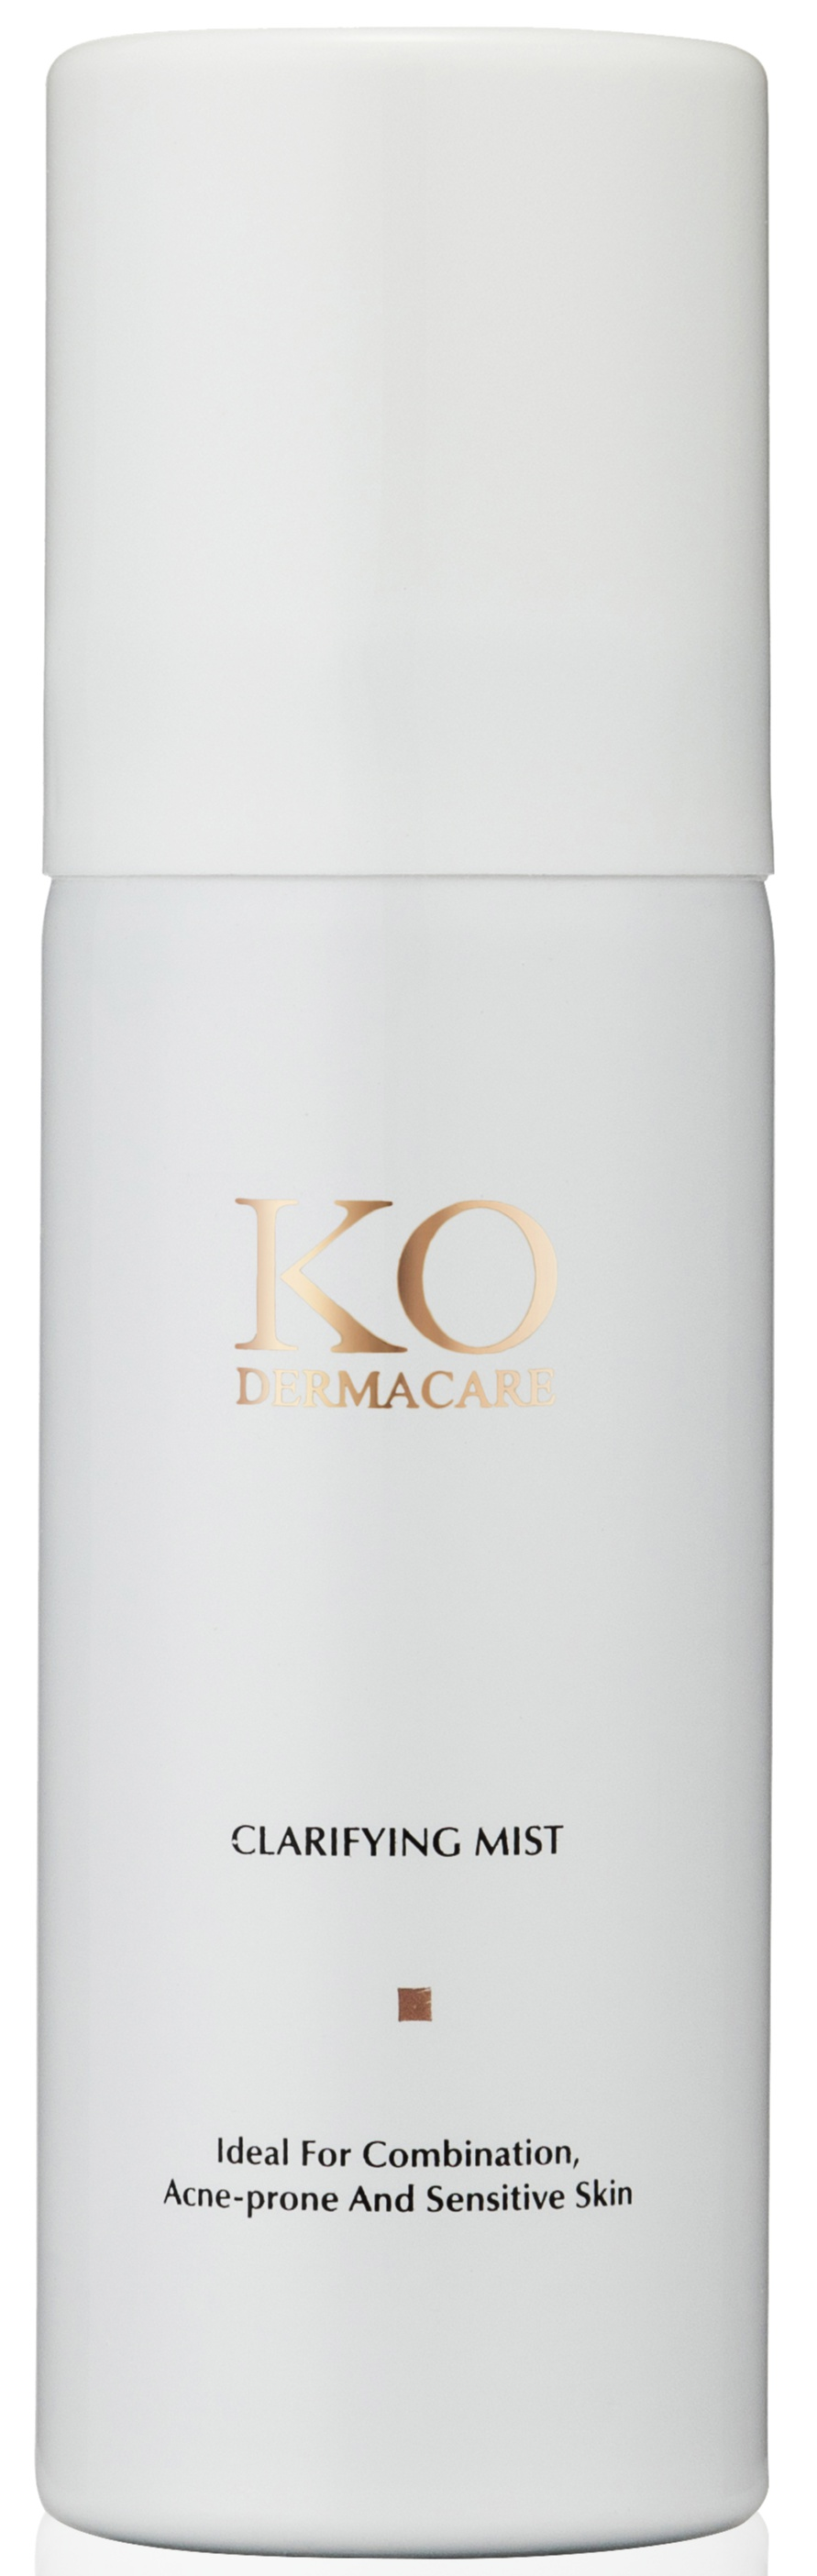 Dr Ko Ko Dermacare Clarifying Mist